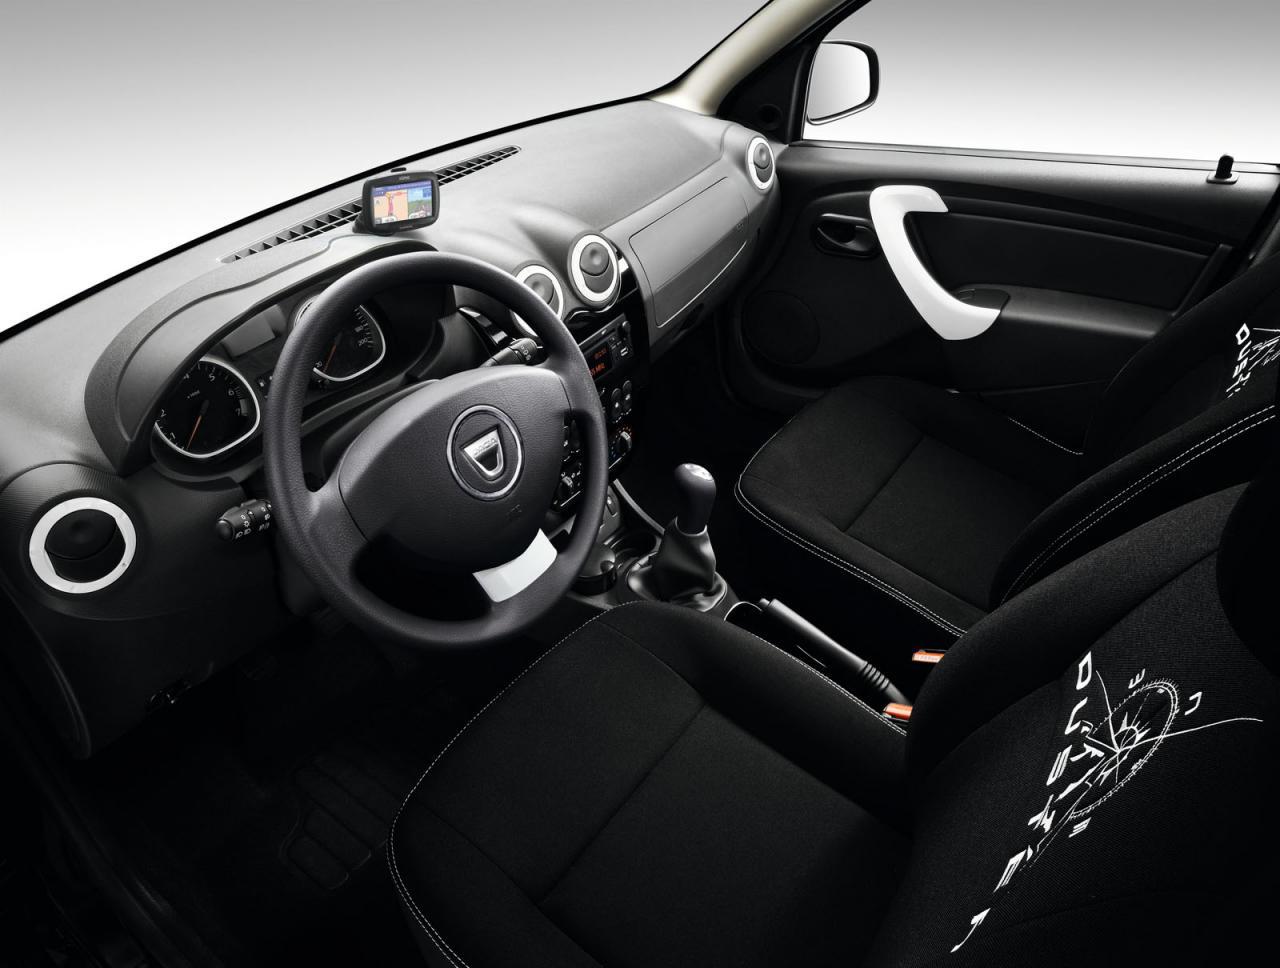 Dacia+Duster+Aventure+Edition+3.jpg